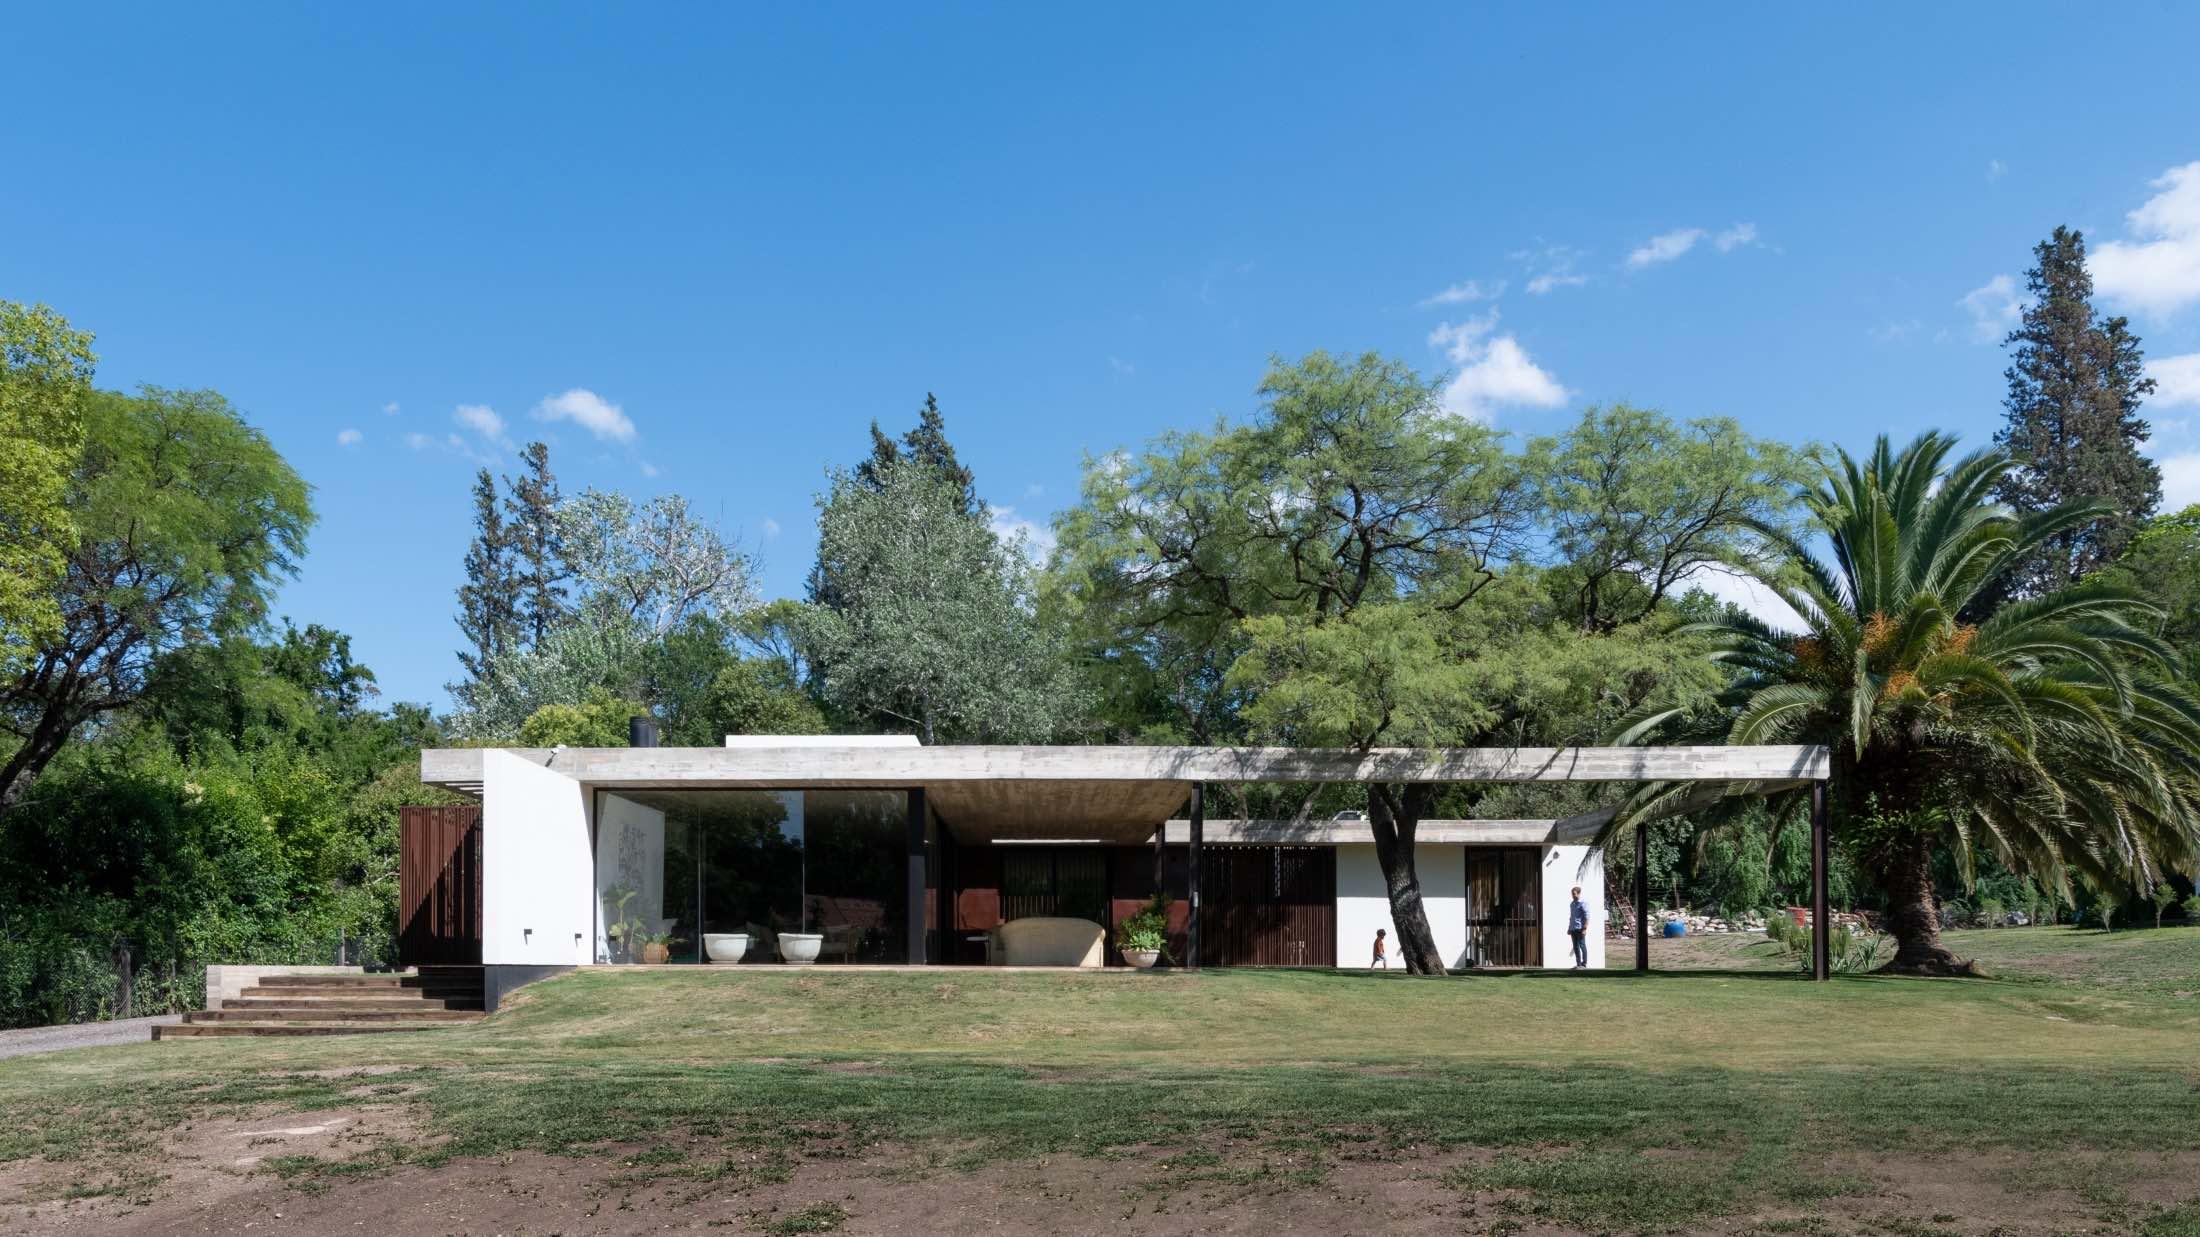 Casa PLC in Córdoba, Argentina designed by Catalina Lanza Castelli + AR Arquitectos